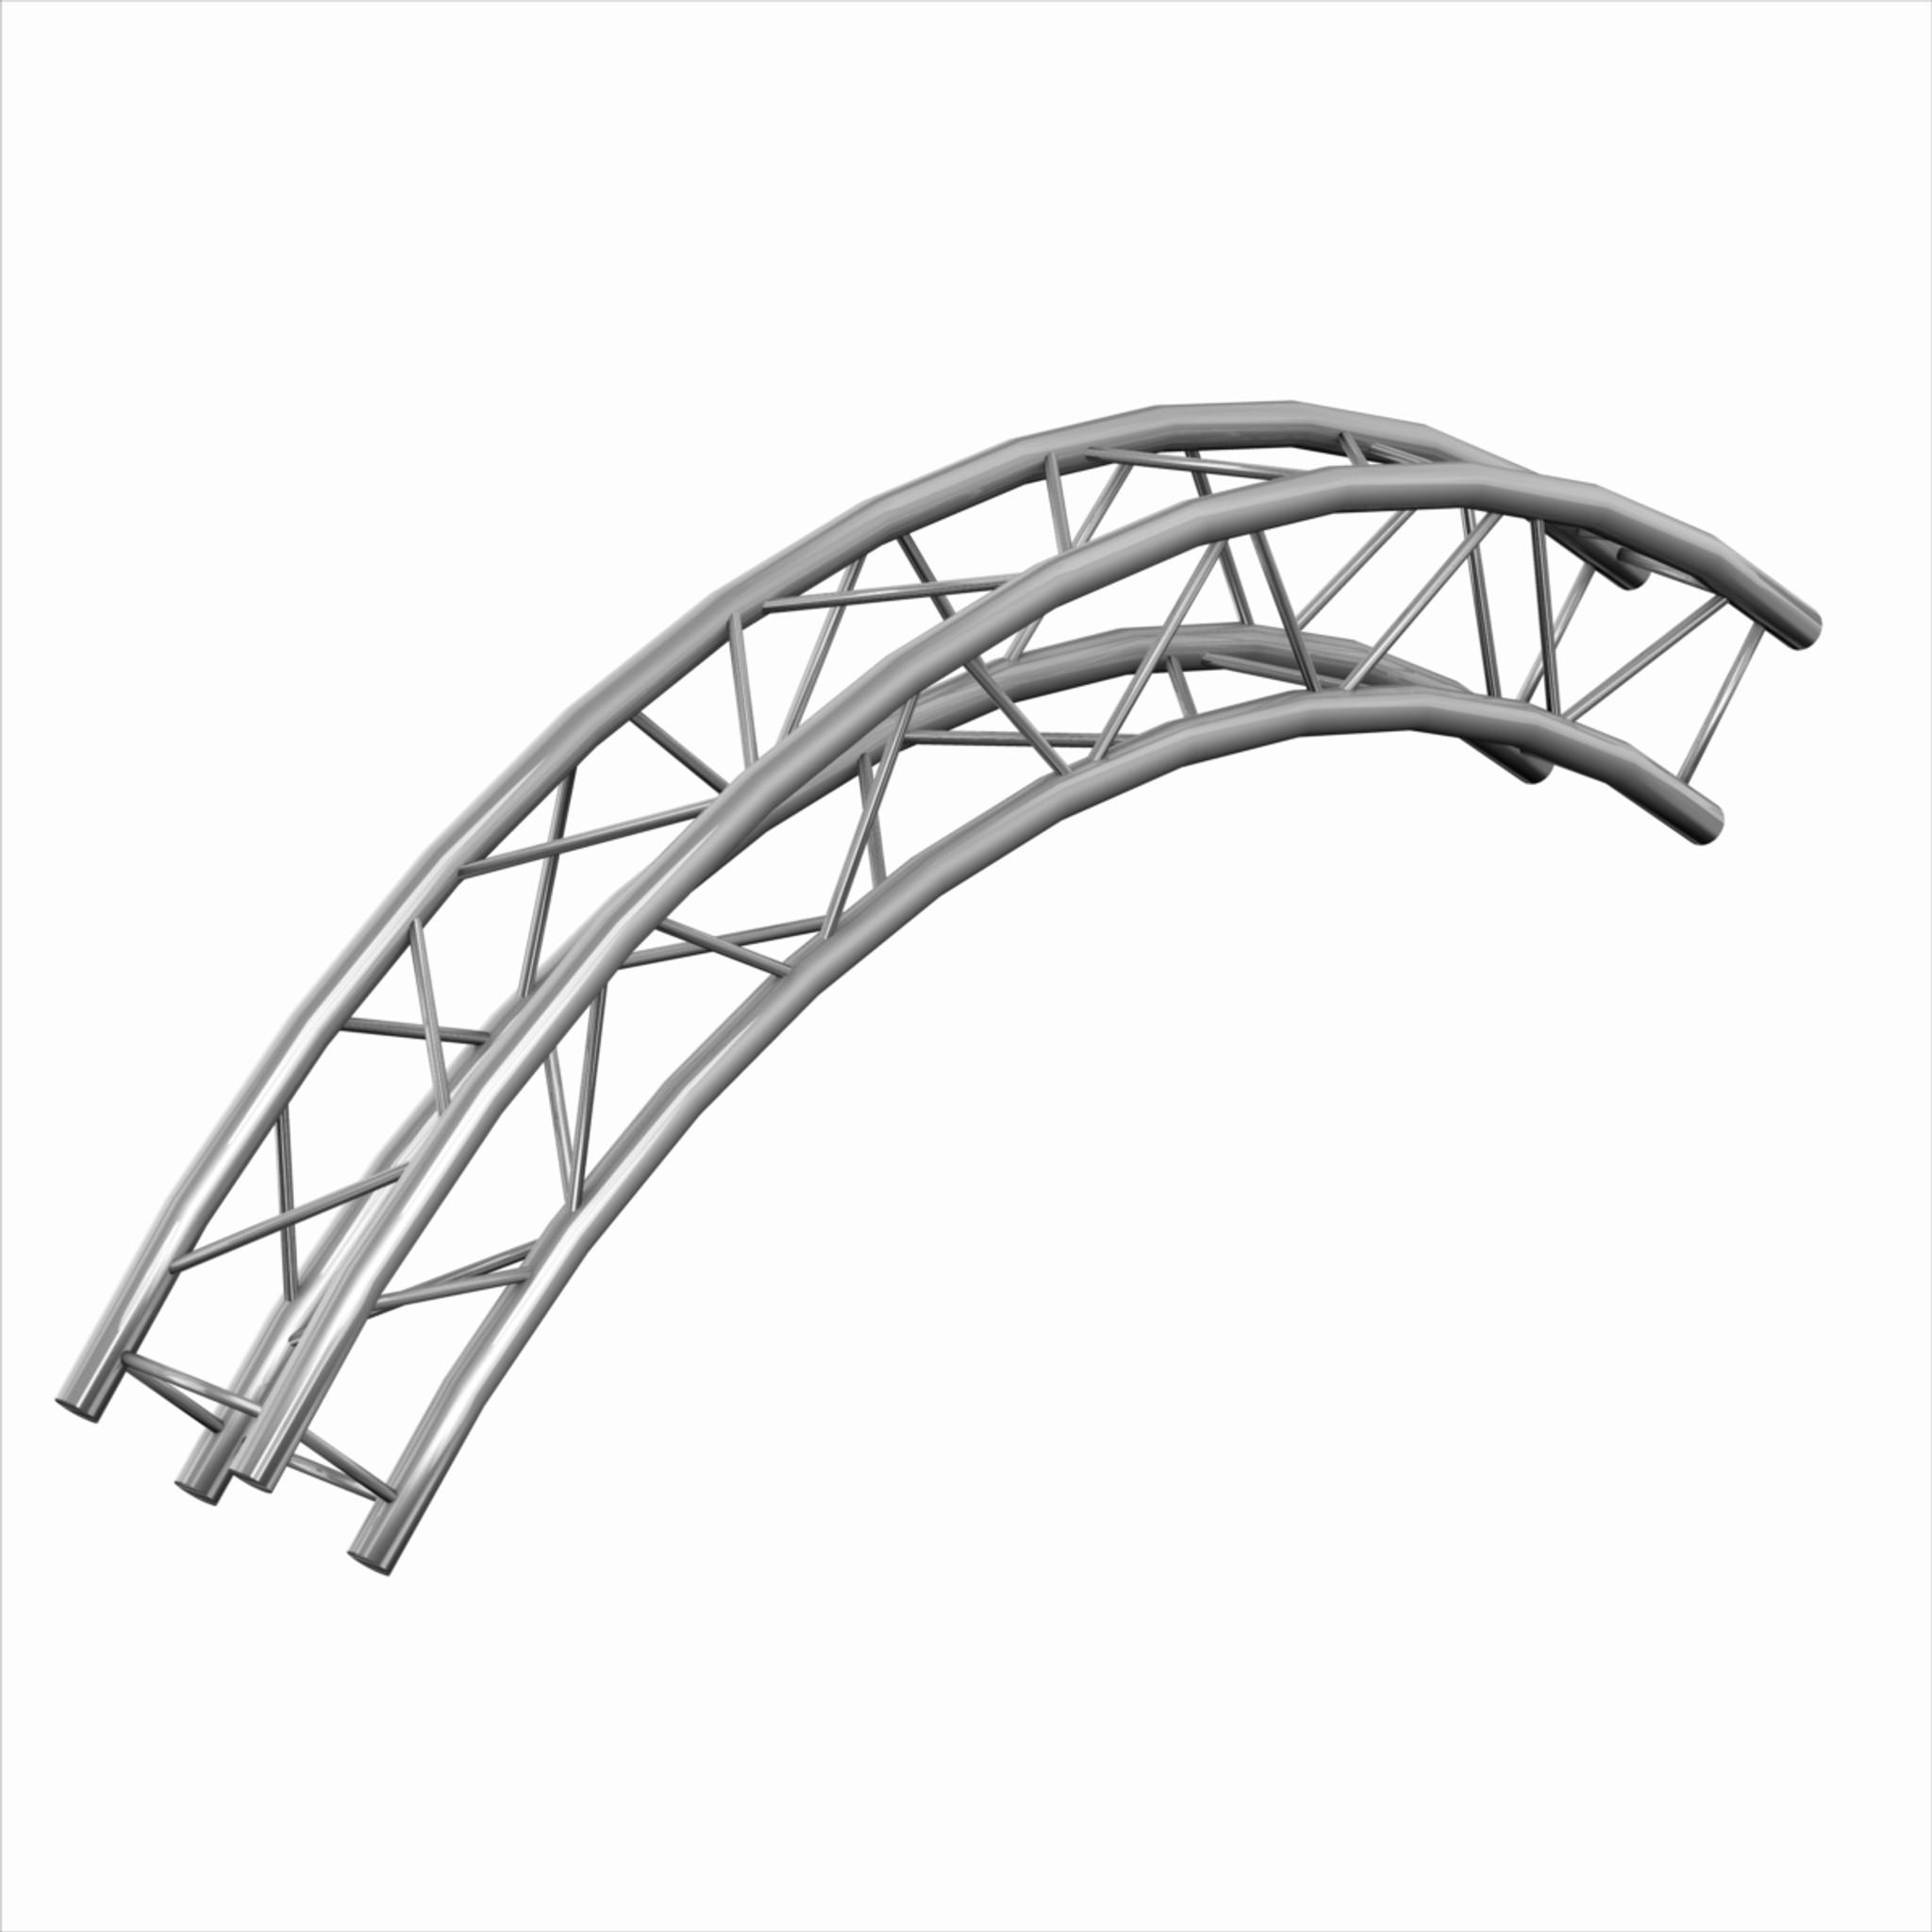 Trusst CT290-430CIR-90 90 Degree Arch Truss 3m